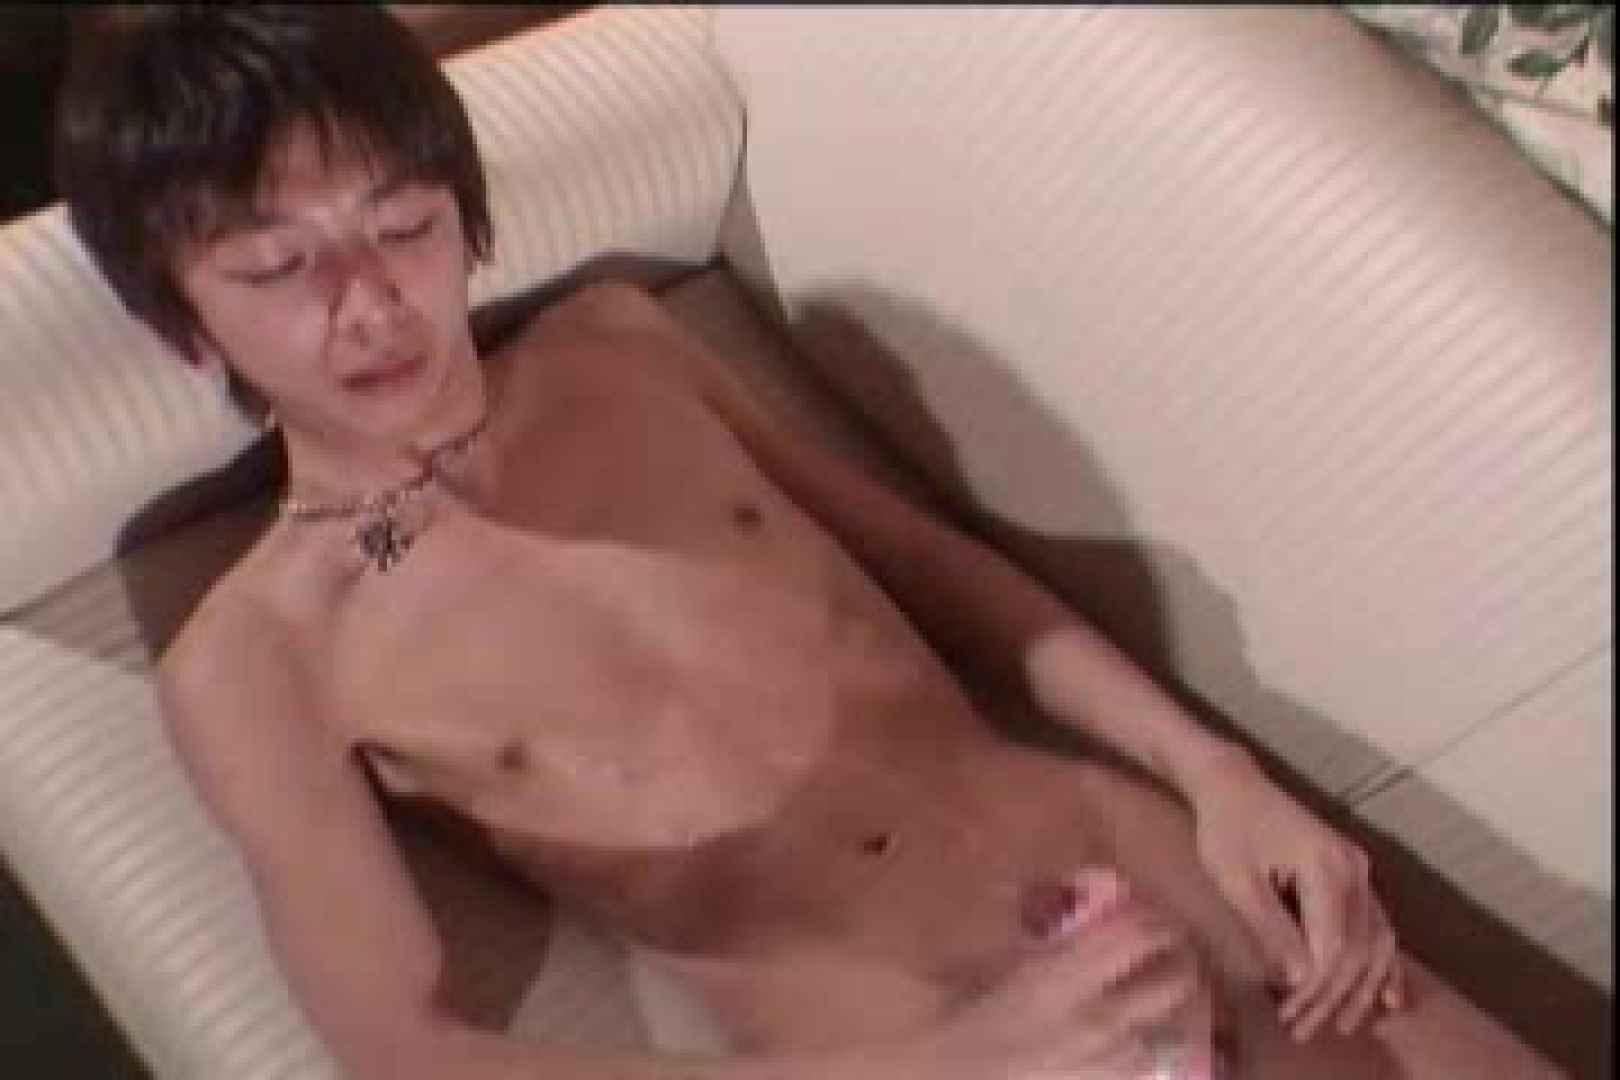 BABY FACEな包茎事情!!4FACEの快楽 射精天国 GAY無修正エロ動画 51pic 10